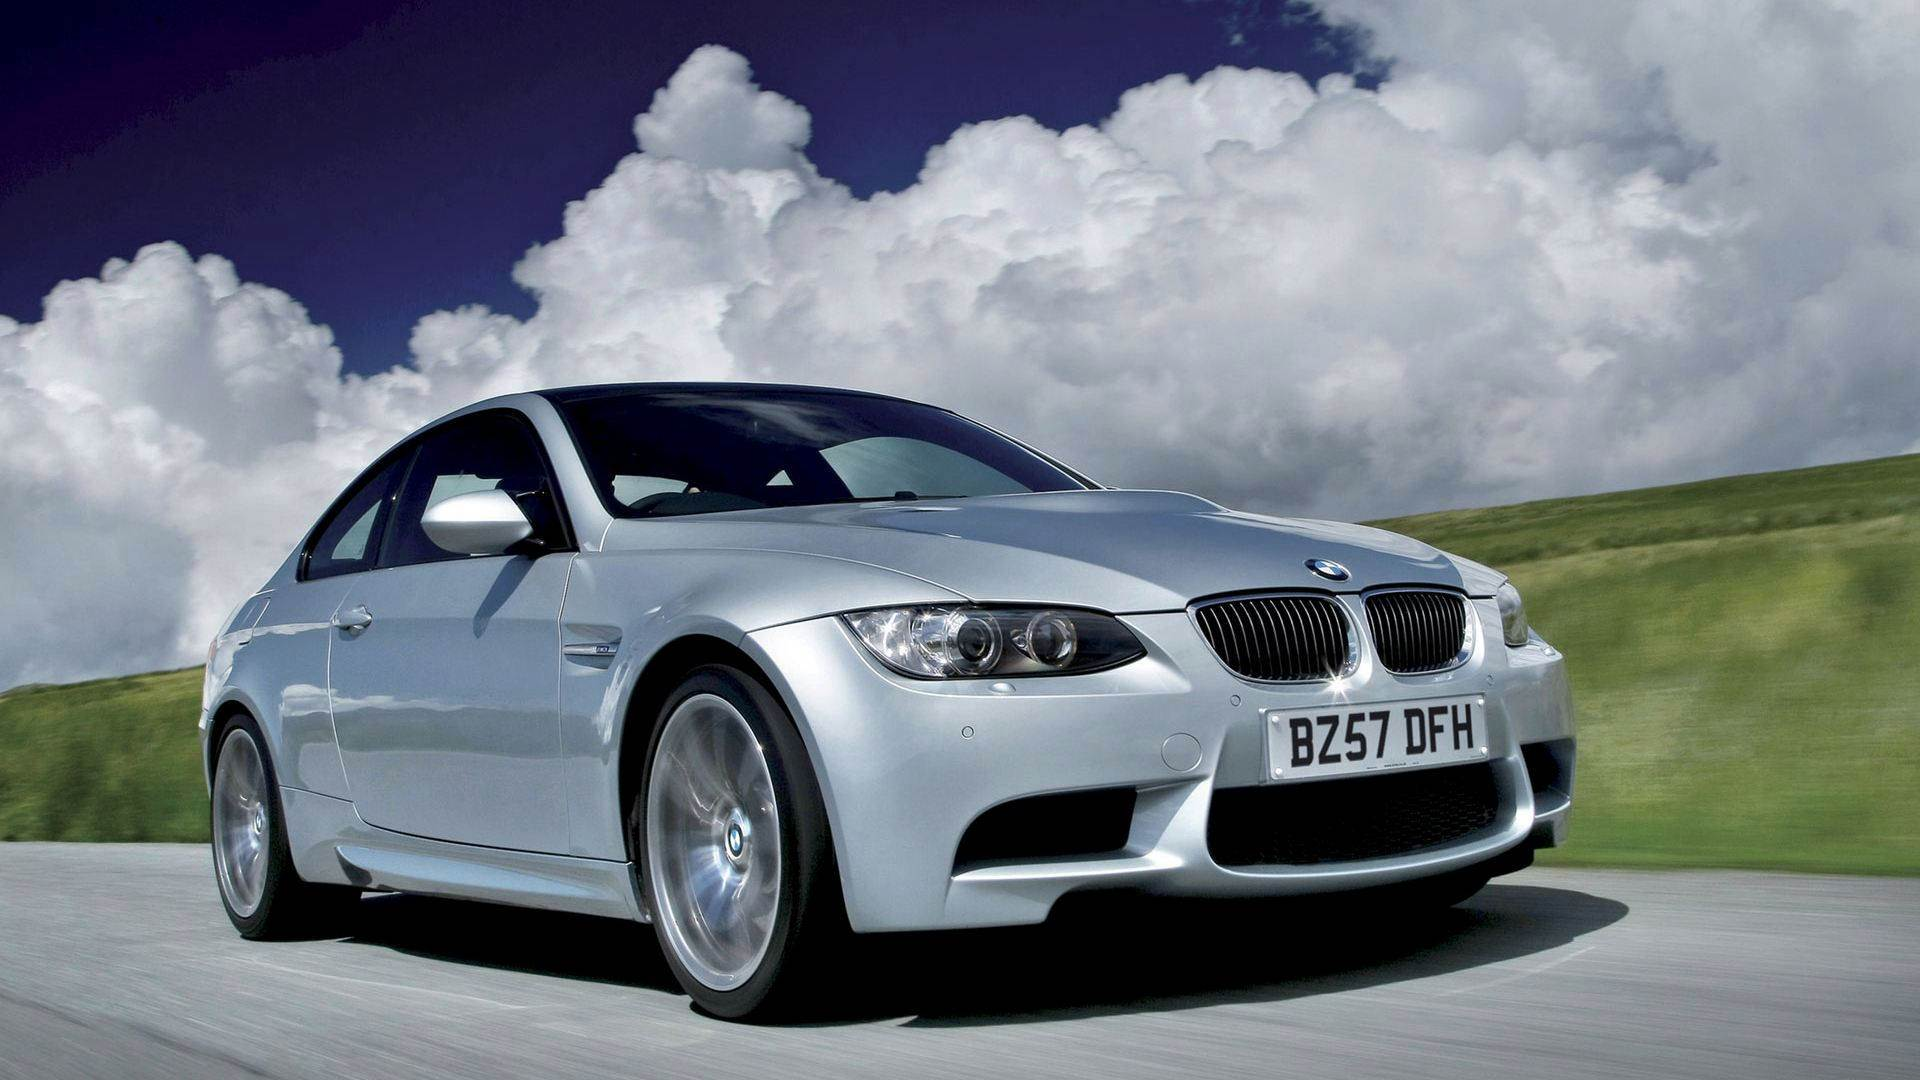 wallpaper: BMW Cars HD Wallpapers